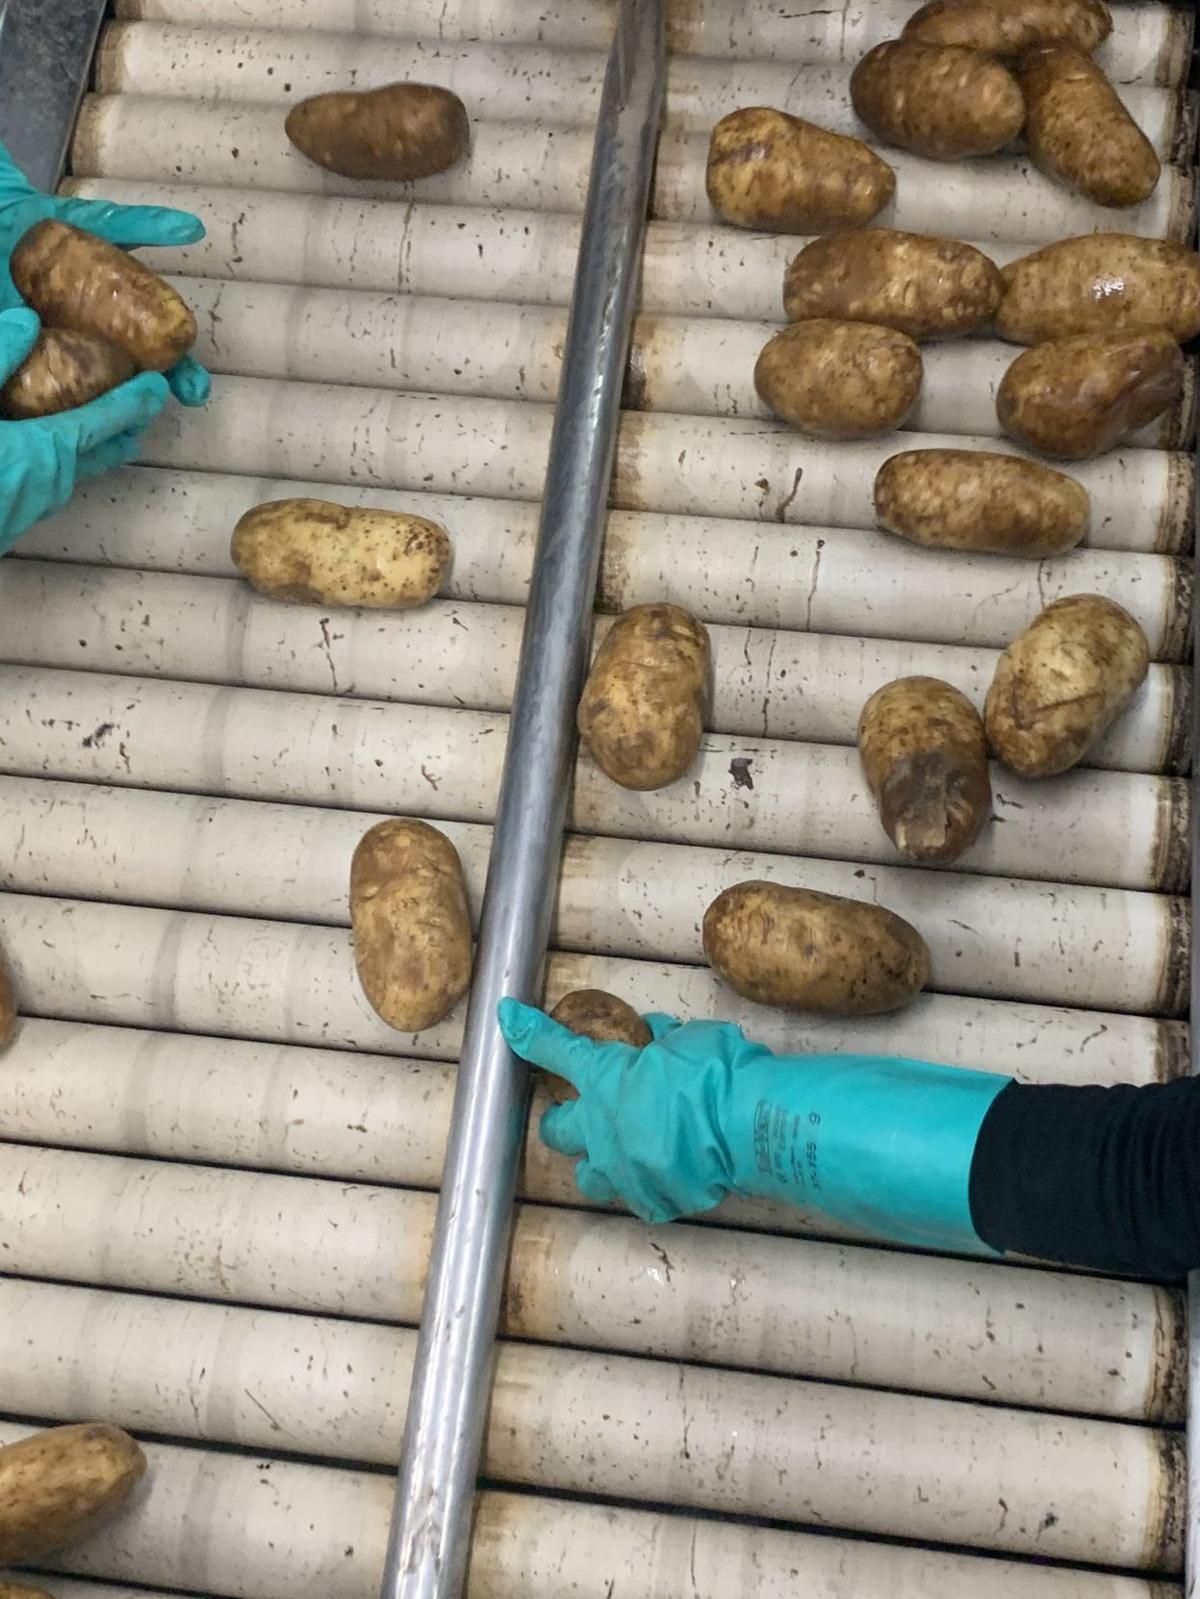 Potato conveyor (copy)